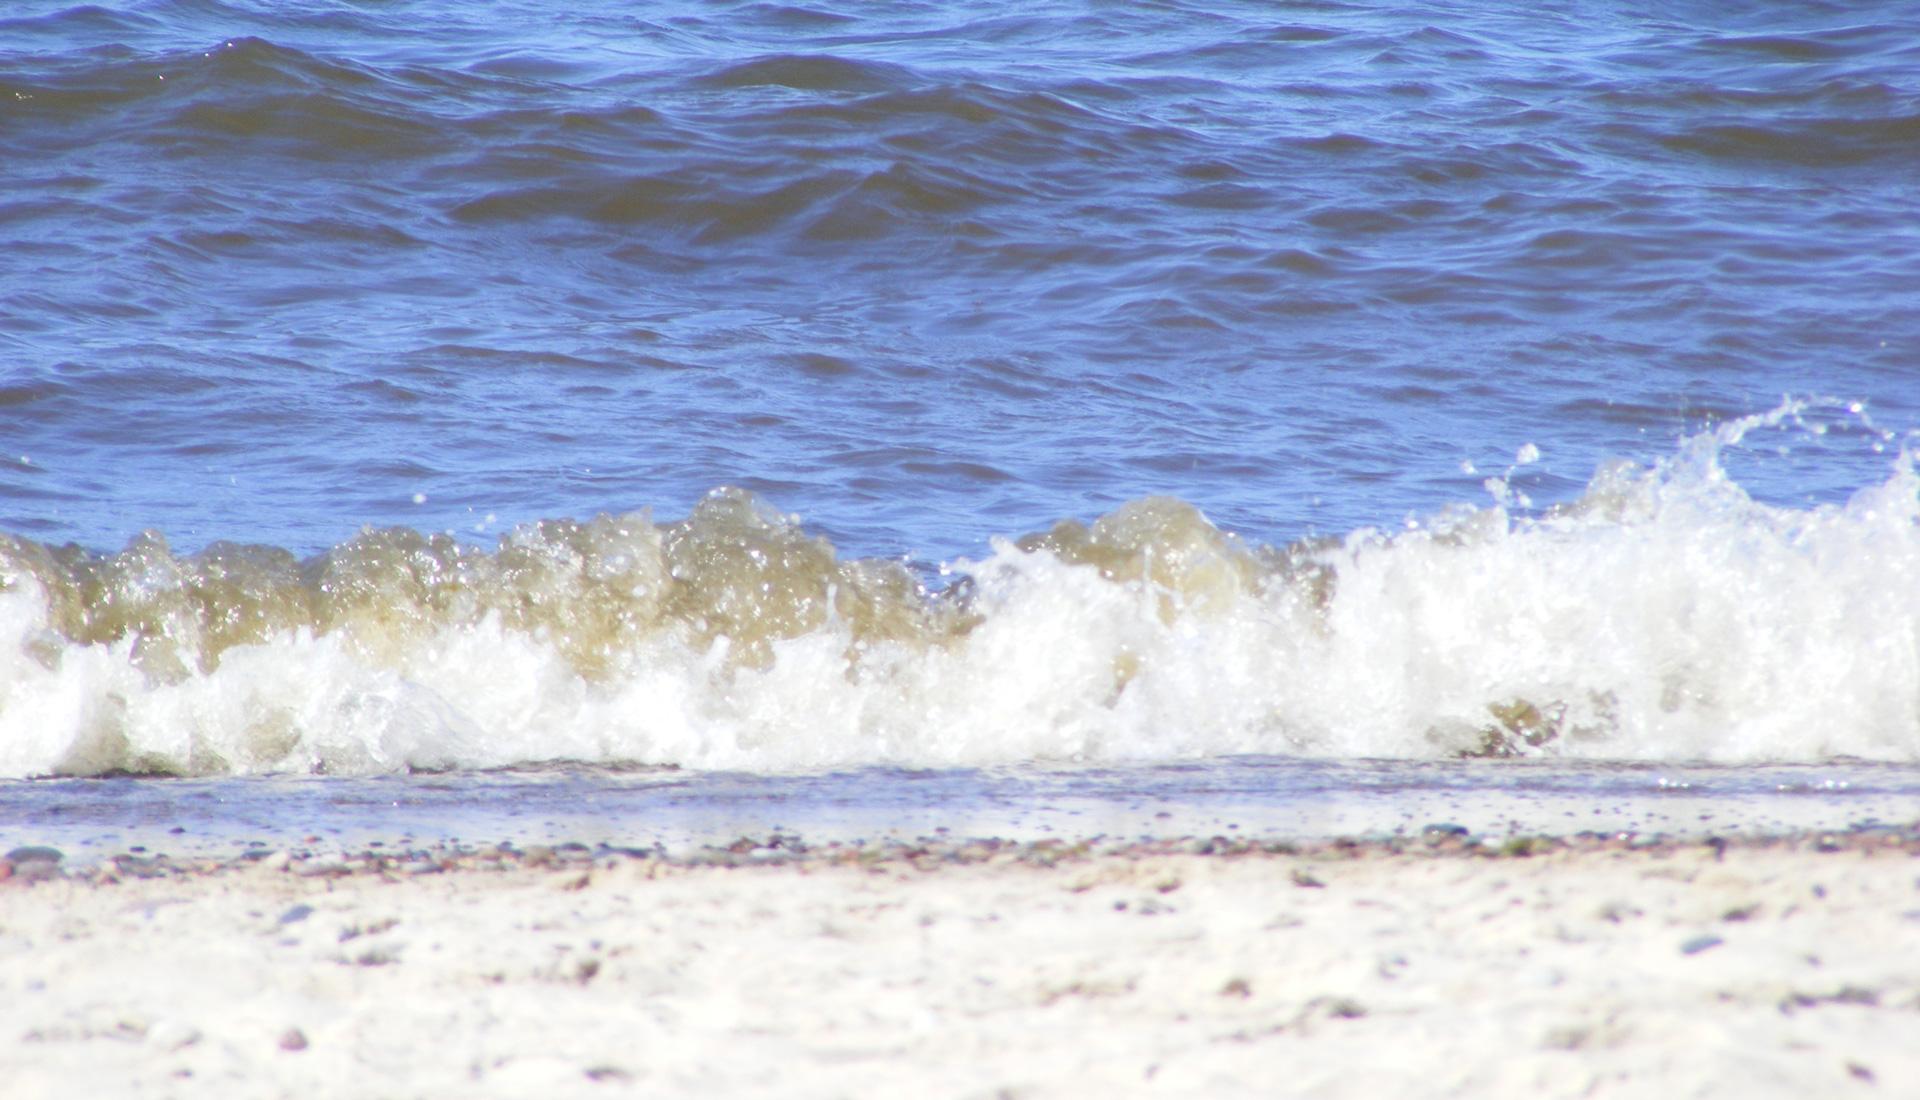 Wellen-an-der-Ostsee-header